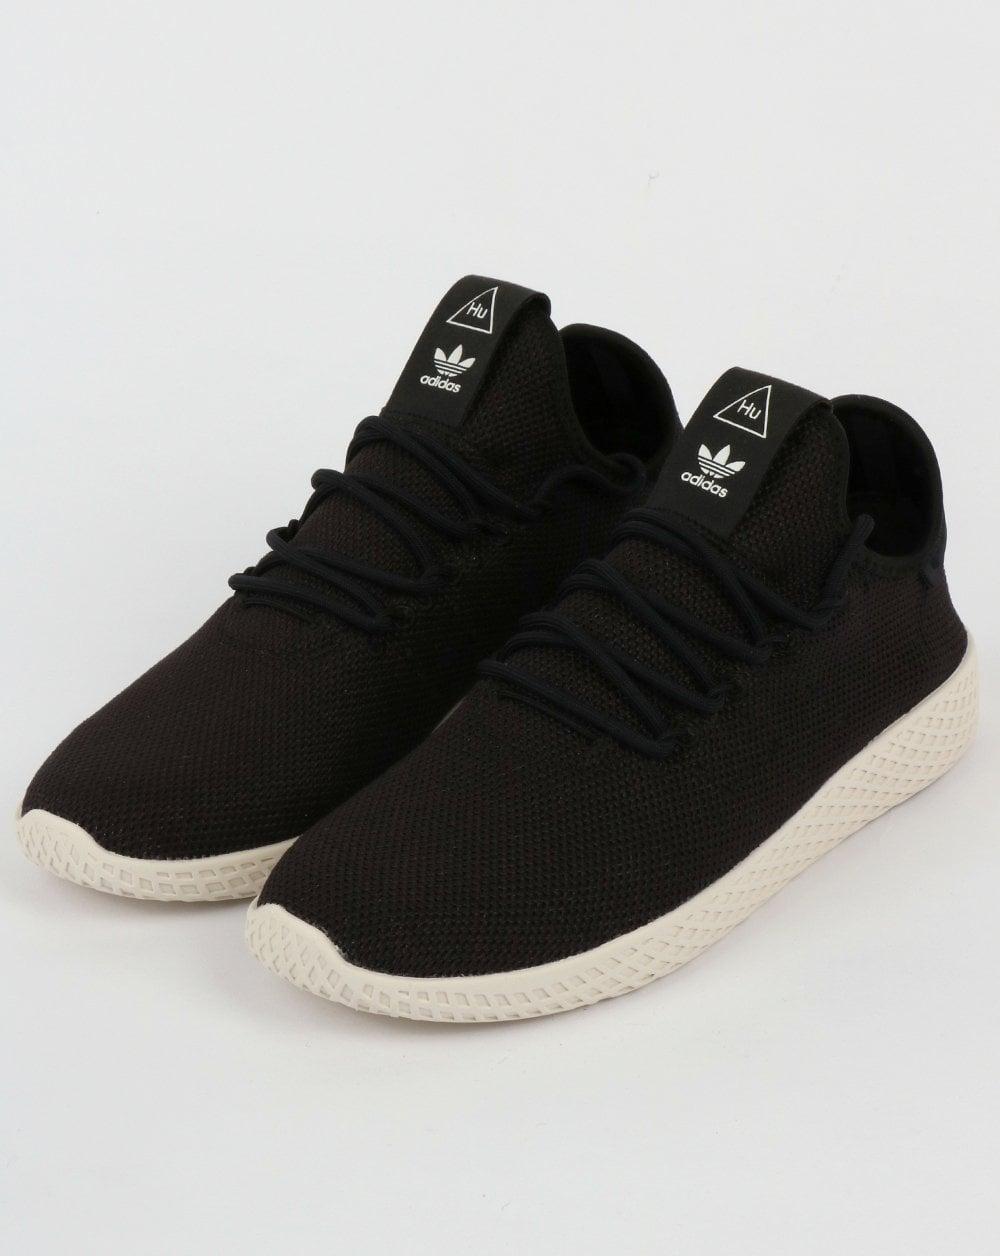 buy uk cheap sale discount Adidas PW Tennis HU Trainers Black/Black/White